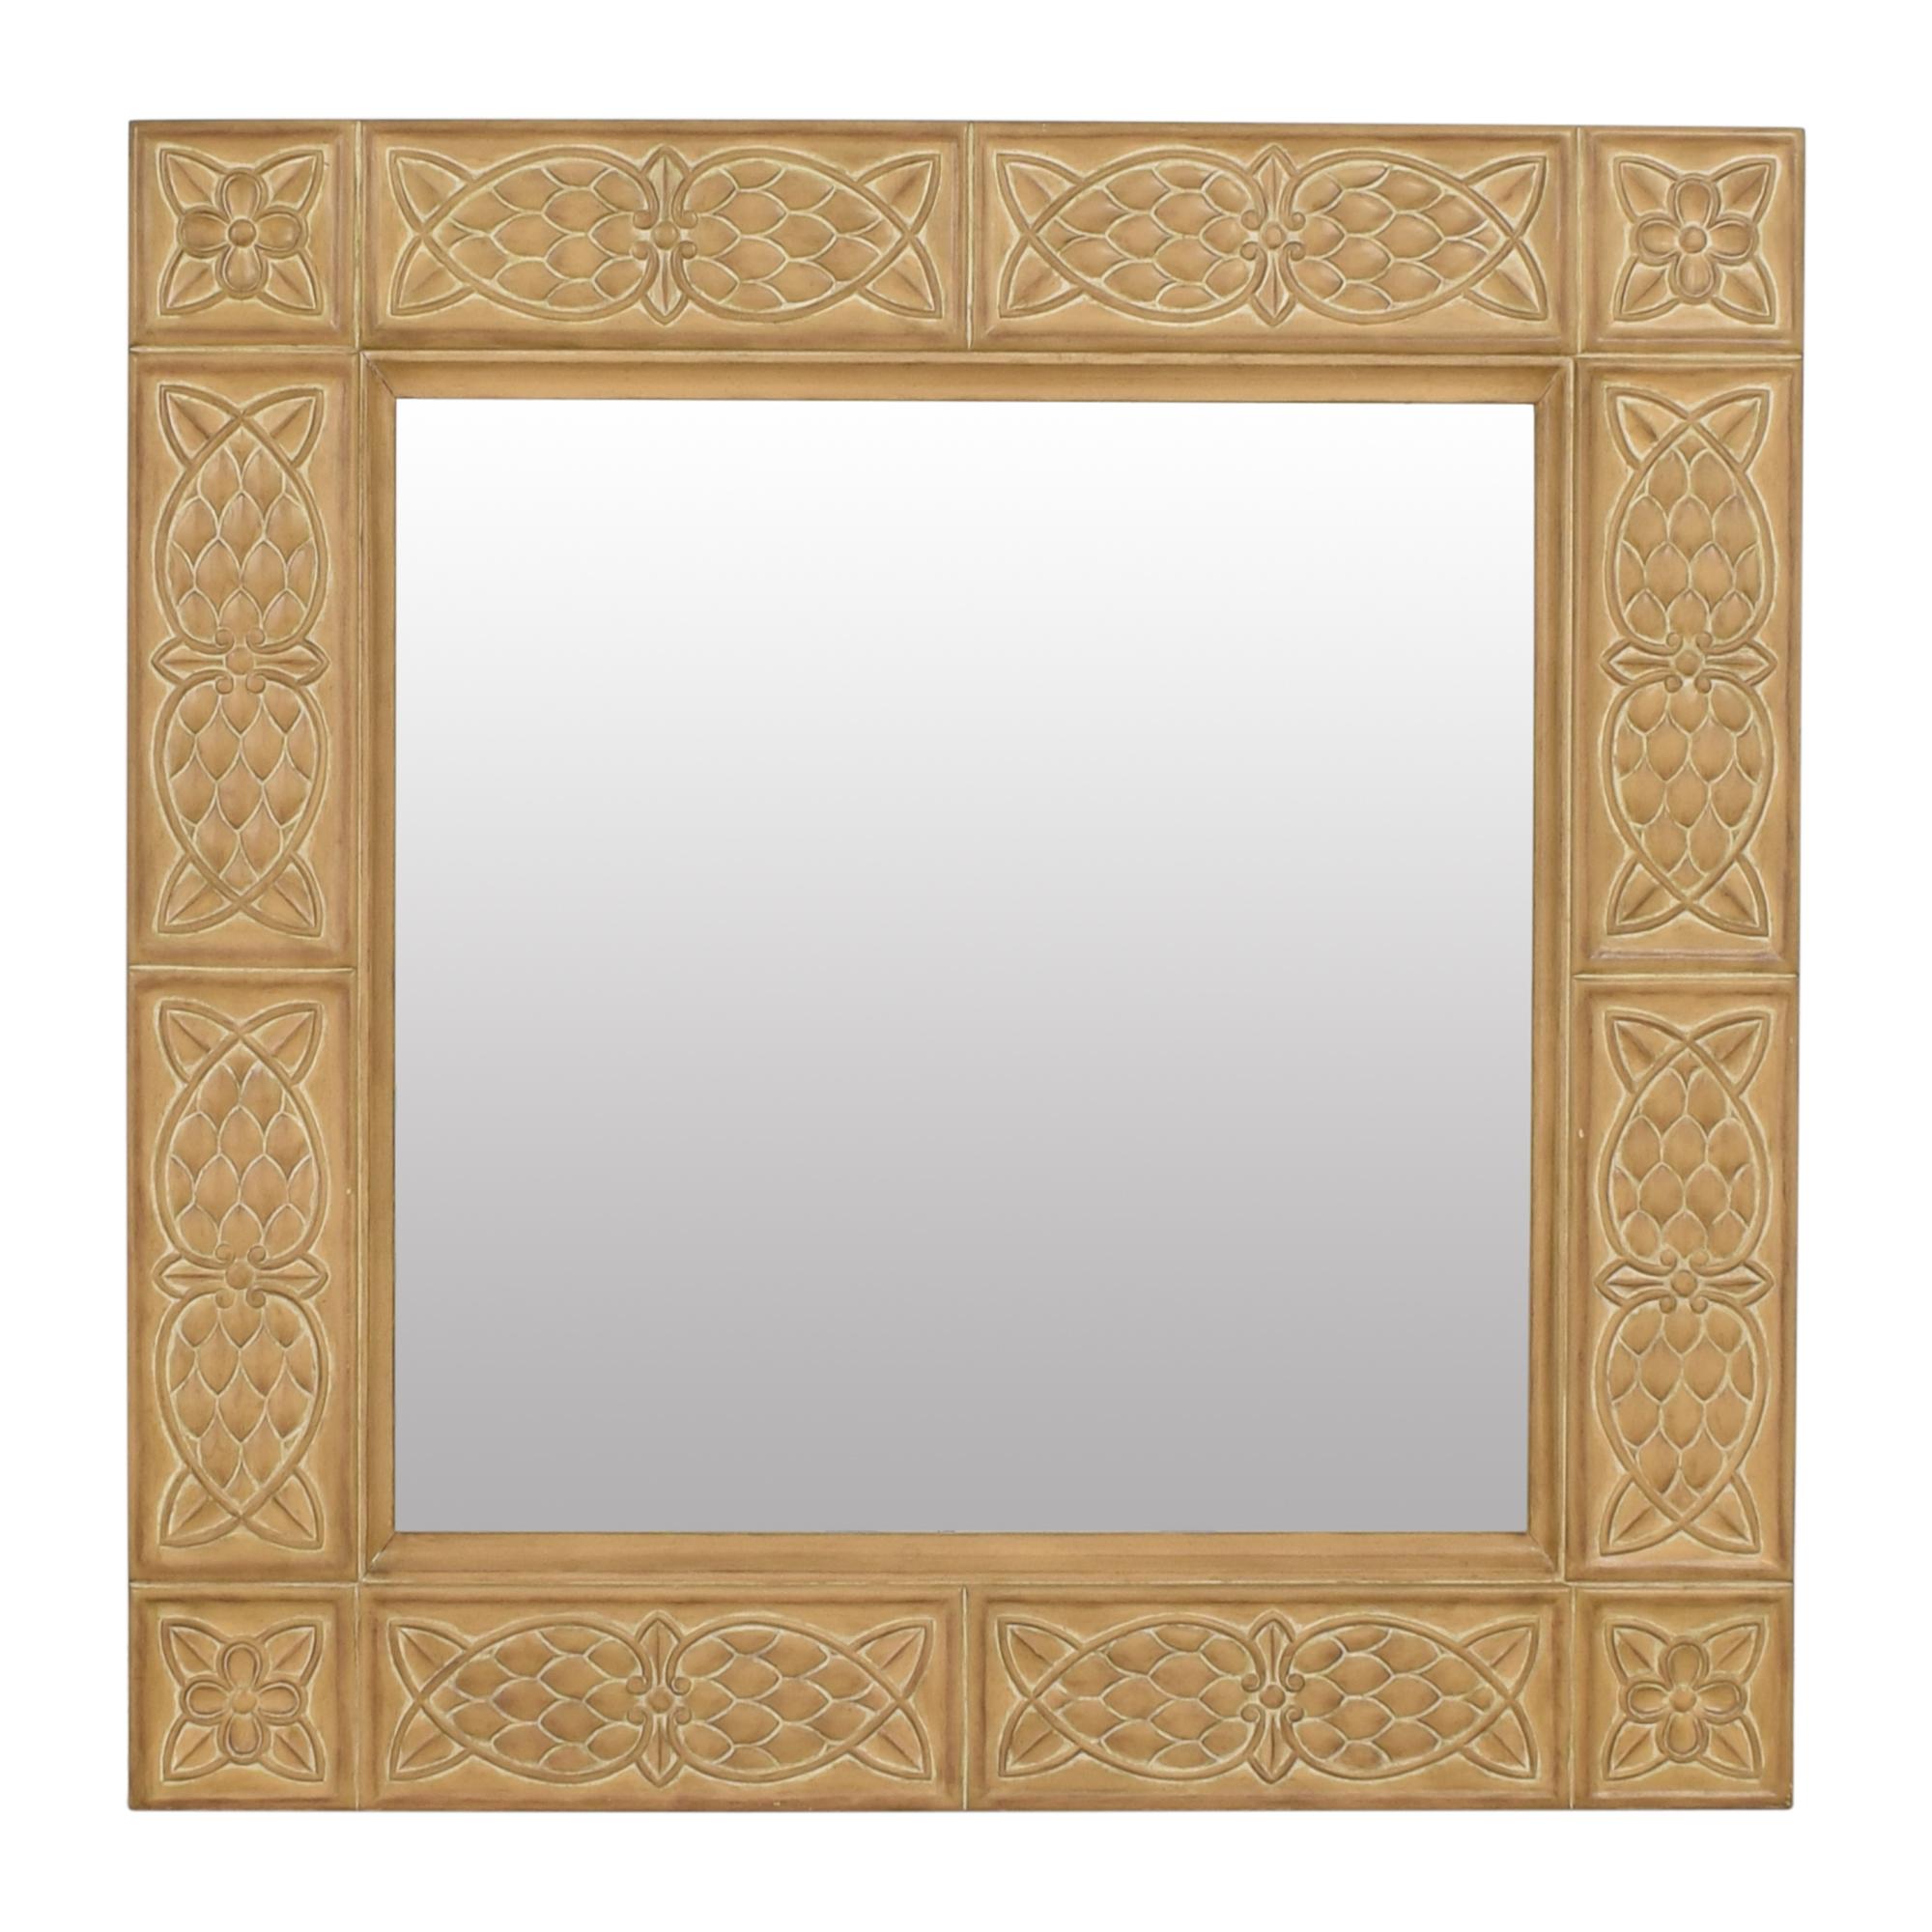 Lexington Furniture Lexington Decorative Framed Wall Mirror discount